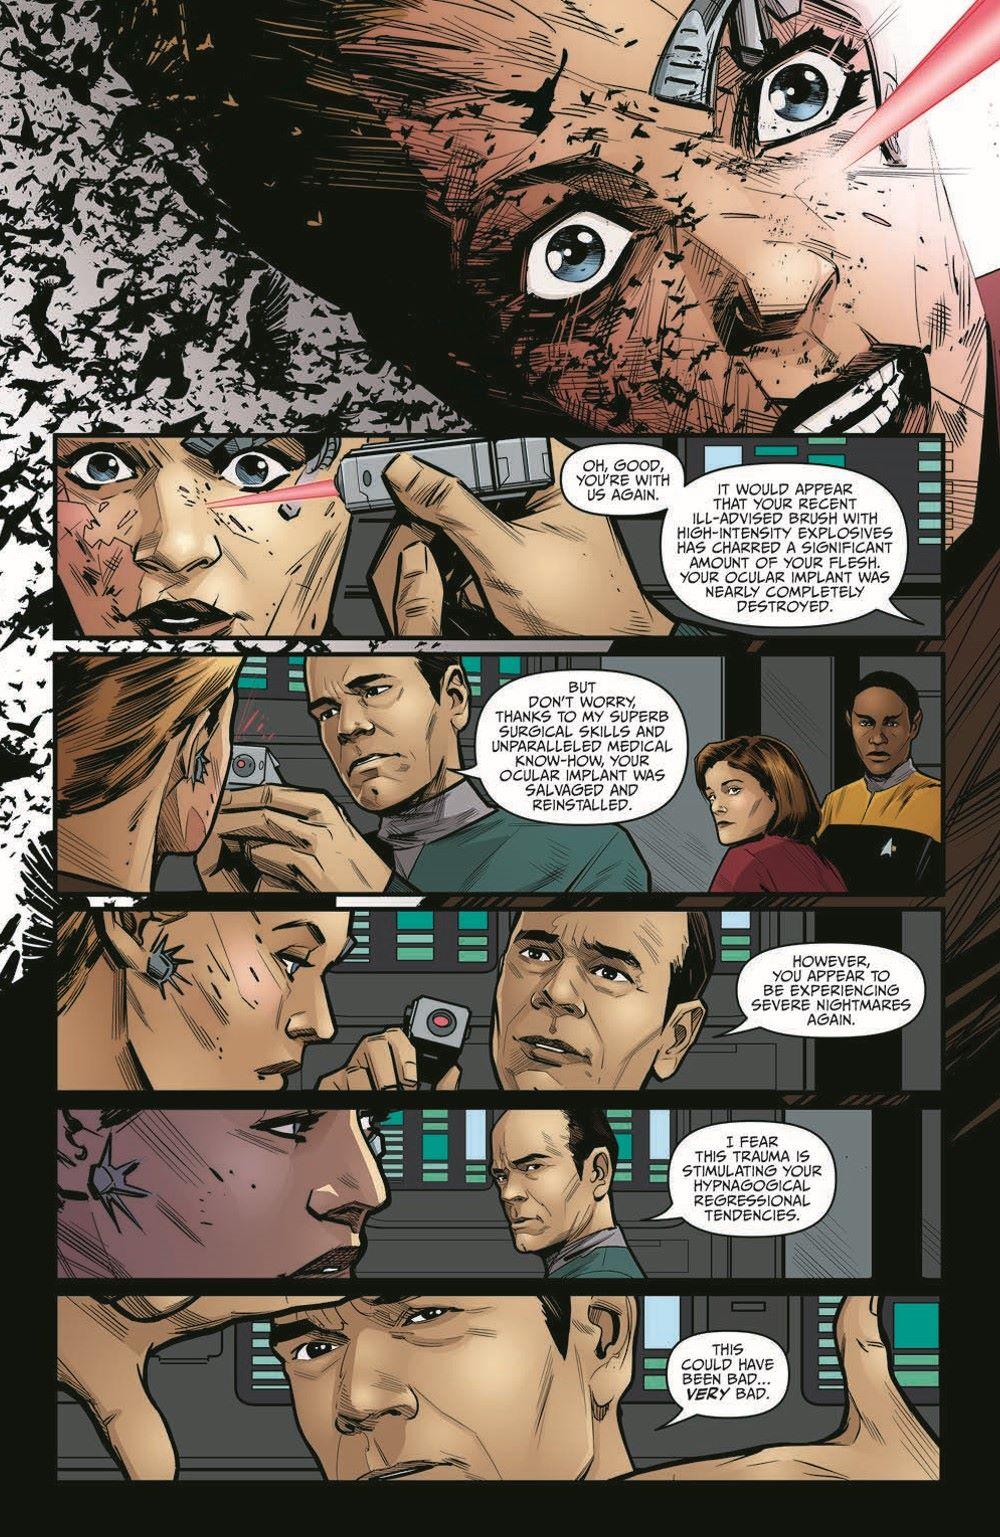 ST_Voyager_SR04-pr-6 ComicList Previews: STAR TREK VOYAGER SEVEN'S RECKONING #4 (OF 4)